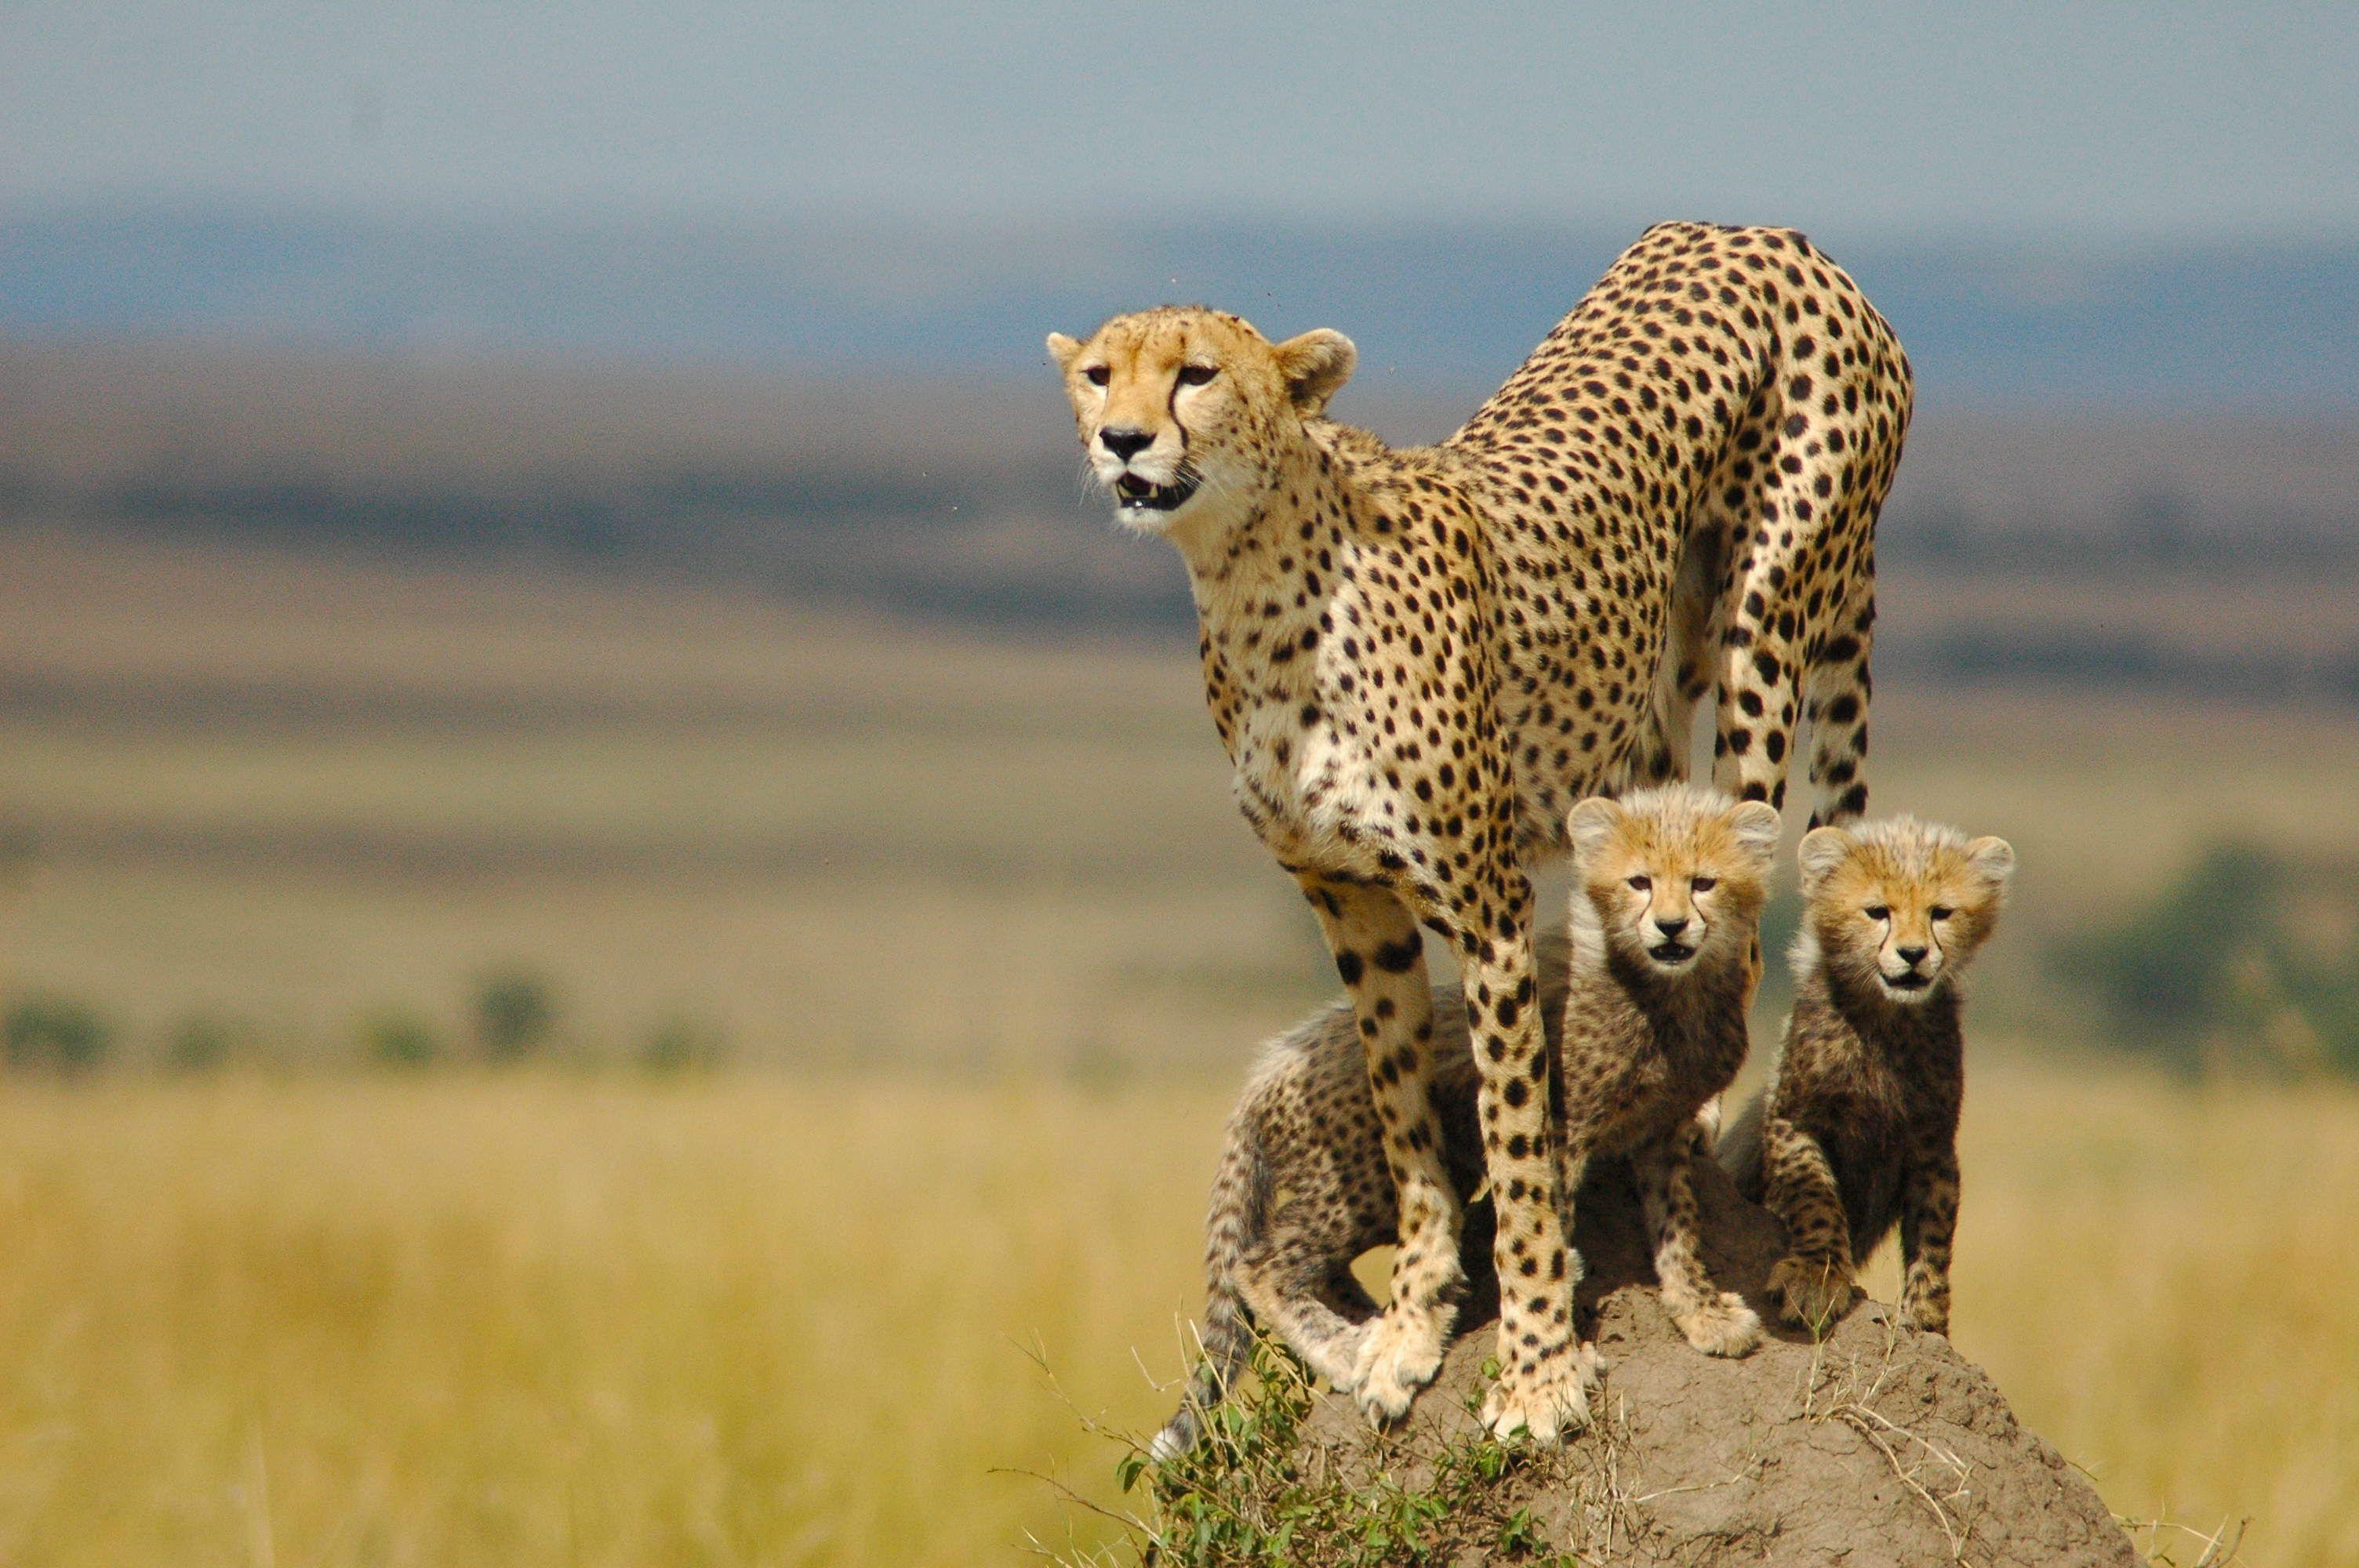 Beautiful Cheetah Image 11865